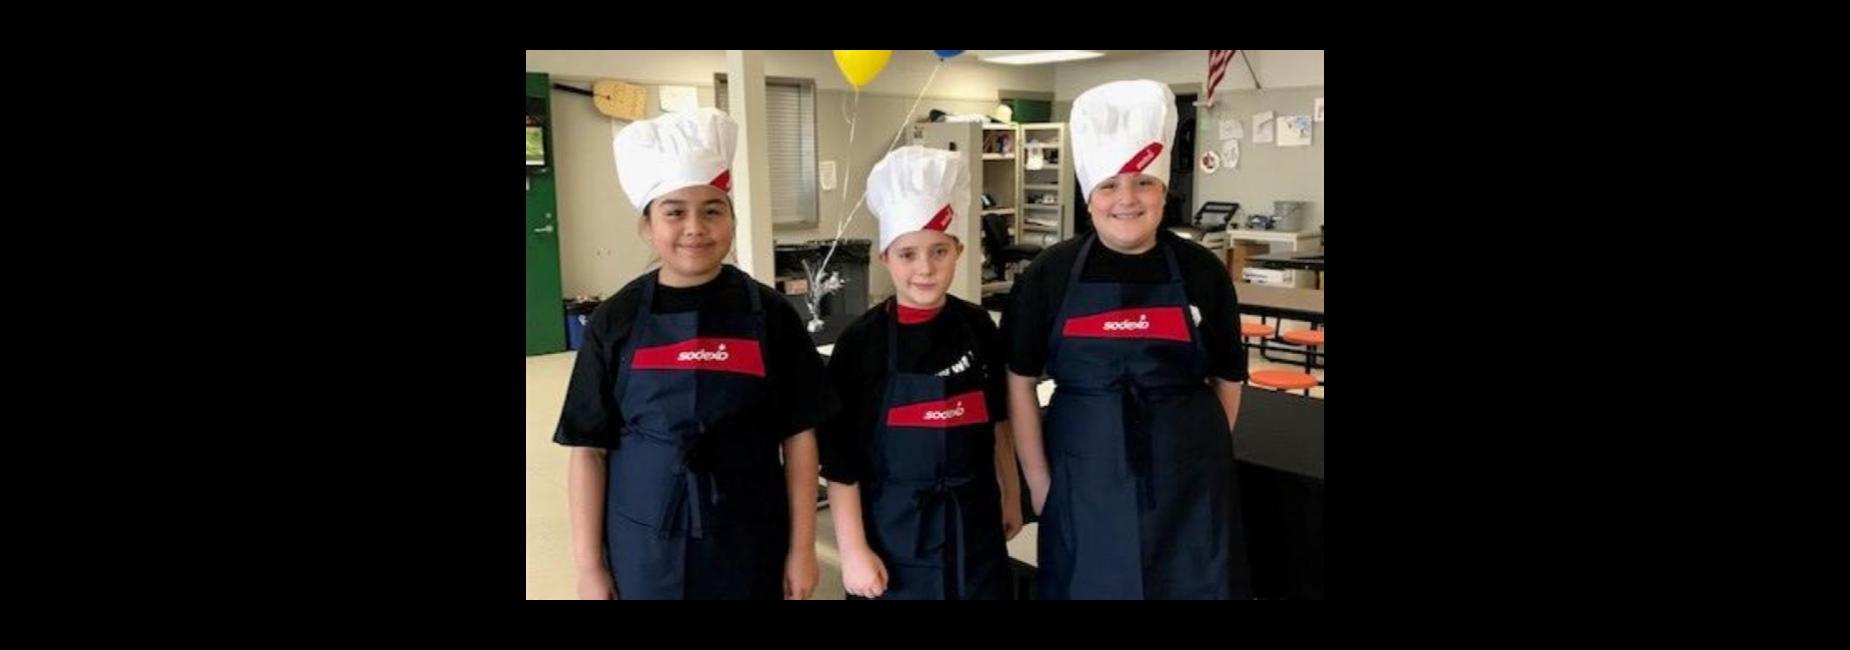 Three student chefs in uniform.